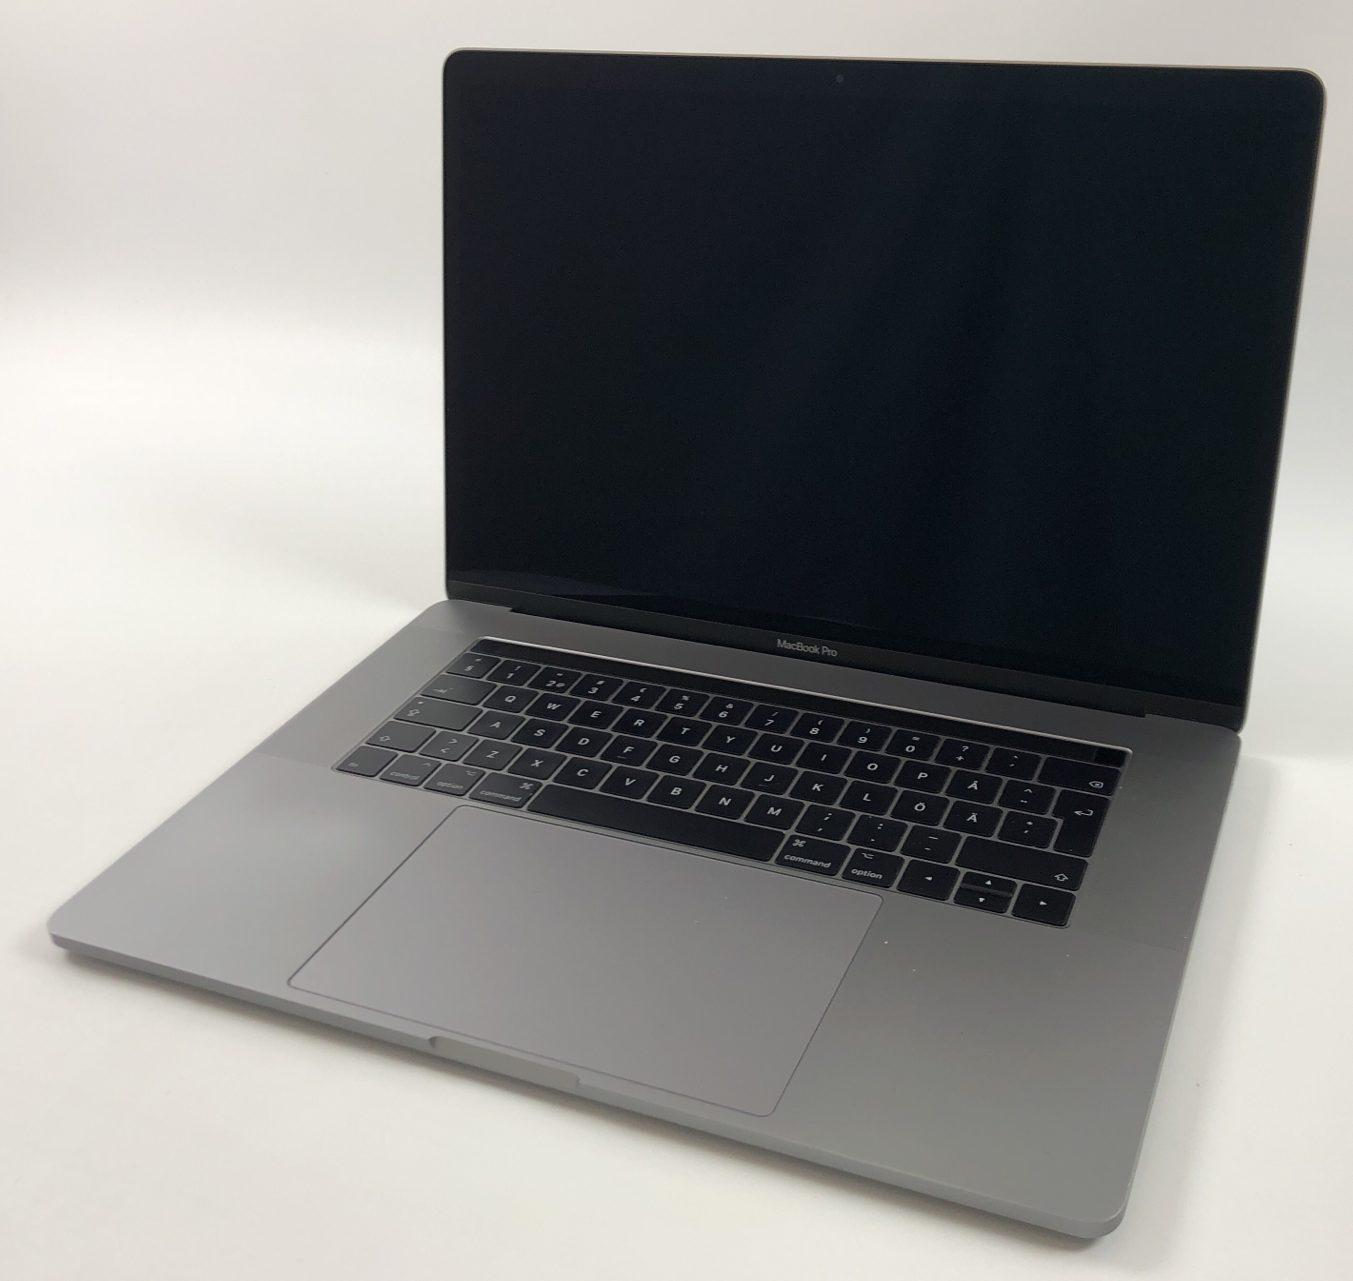 "MacBook Pro 15"" Touch Bar Late 2016 (Intel Quad-Core i7 2.9 GHz 16 GB RAM 512 GB SSD), Space Gray, Intel Quad-Core i7 2.9 GHz, 16 GB RAM, 512 GB SSD, Kuva 1"